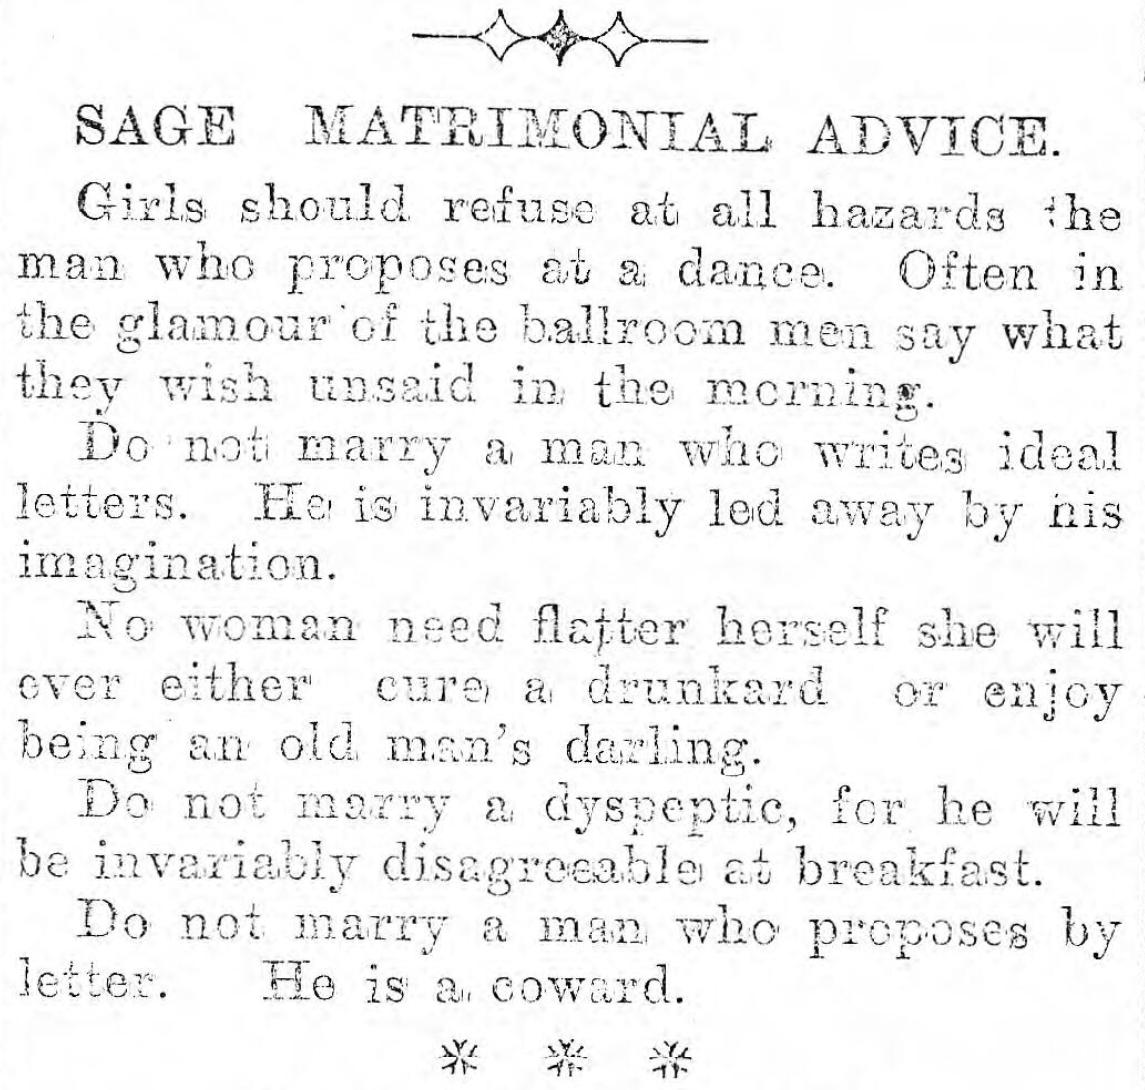 'Sage matrimonial advice'  Llandudno Advertiser • 1903   #Wales #History pic.twitter.com/Dh7NgQGcBH